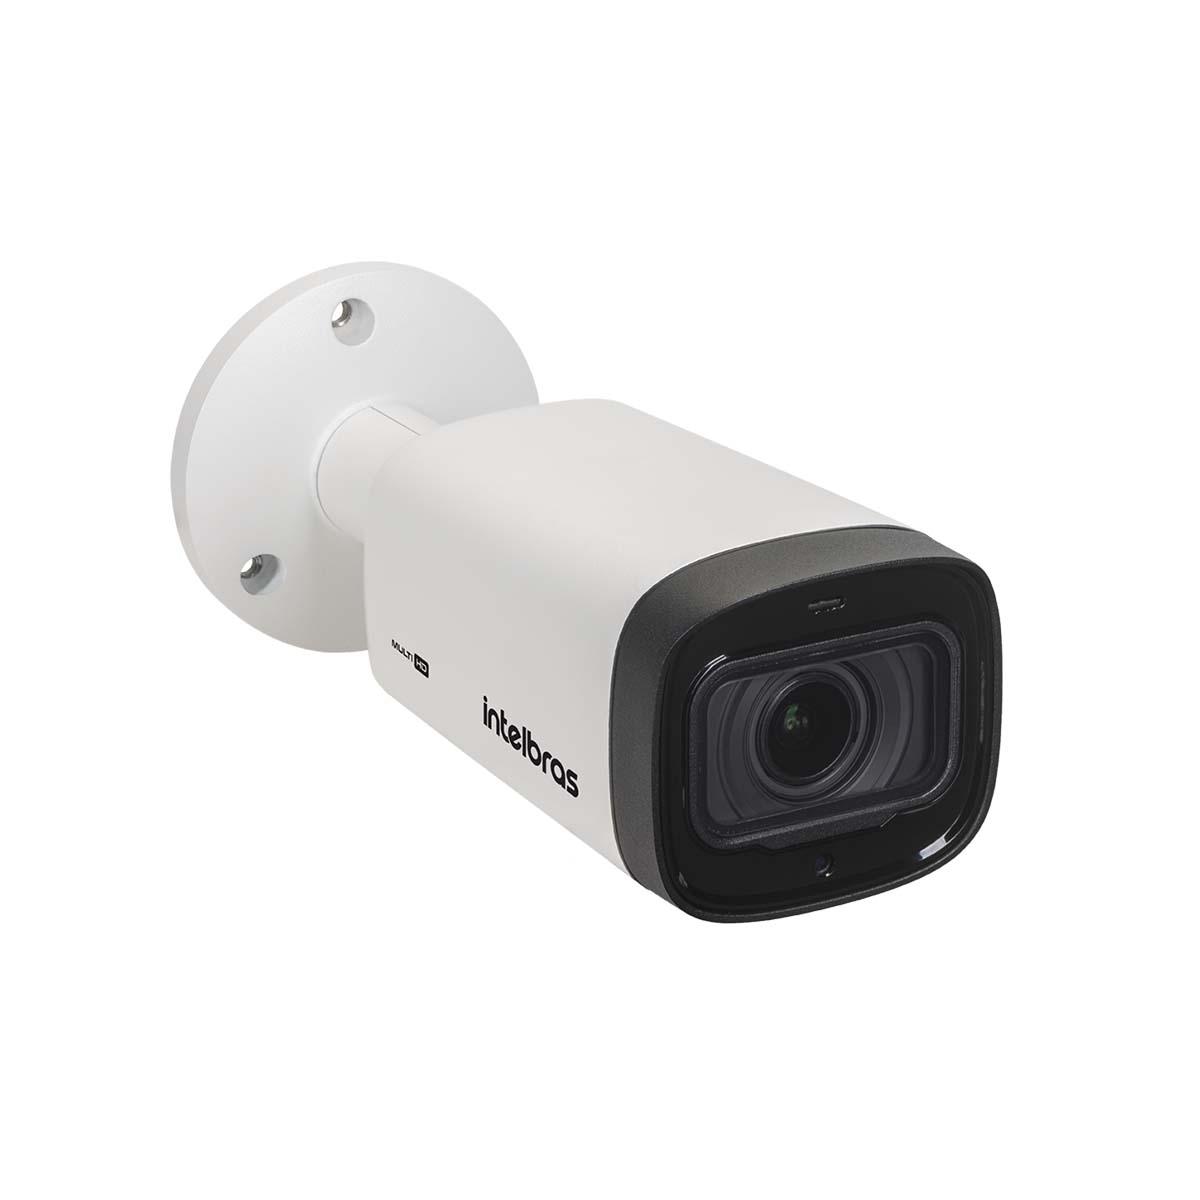 Kit 06 Câmera Intelbras Vhd 3240 Vf G6 1080p 2,7 A 12mm